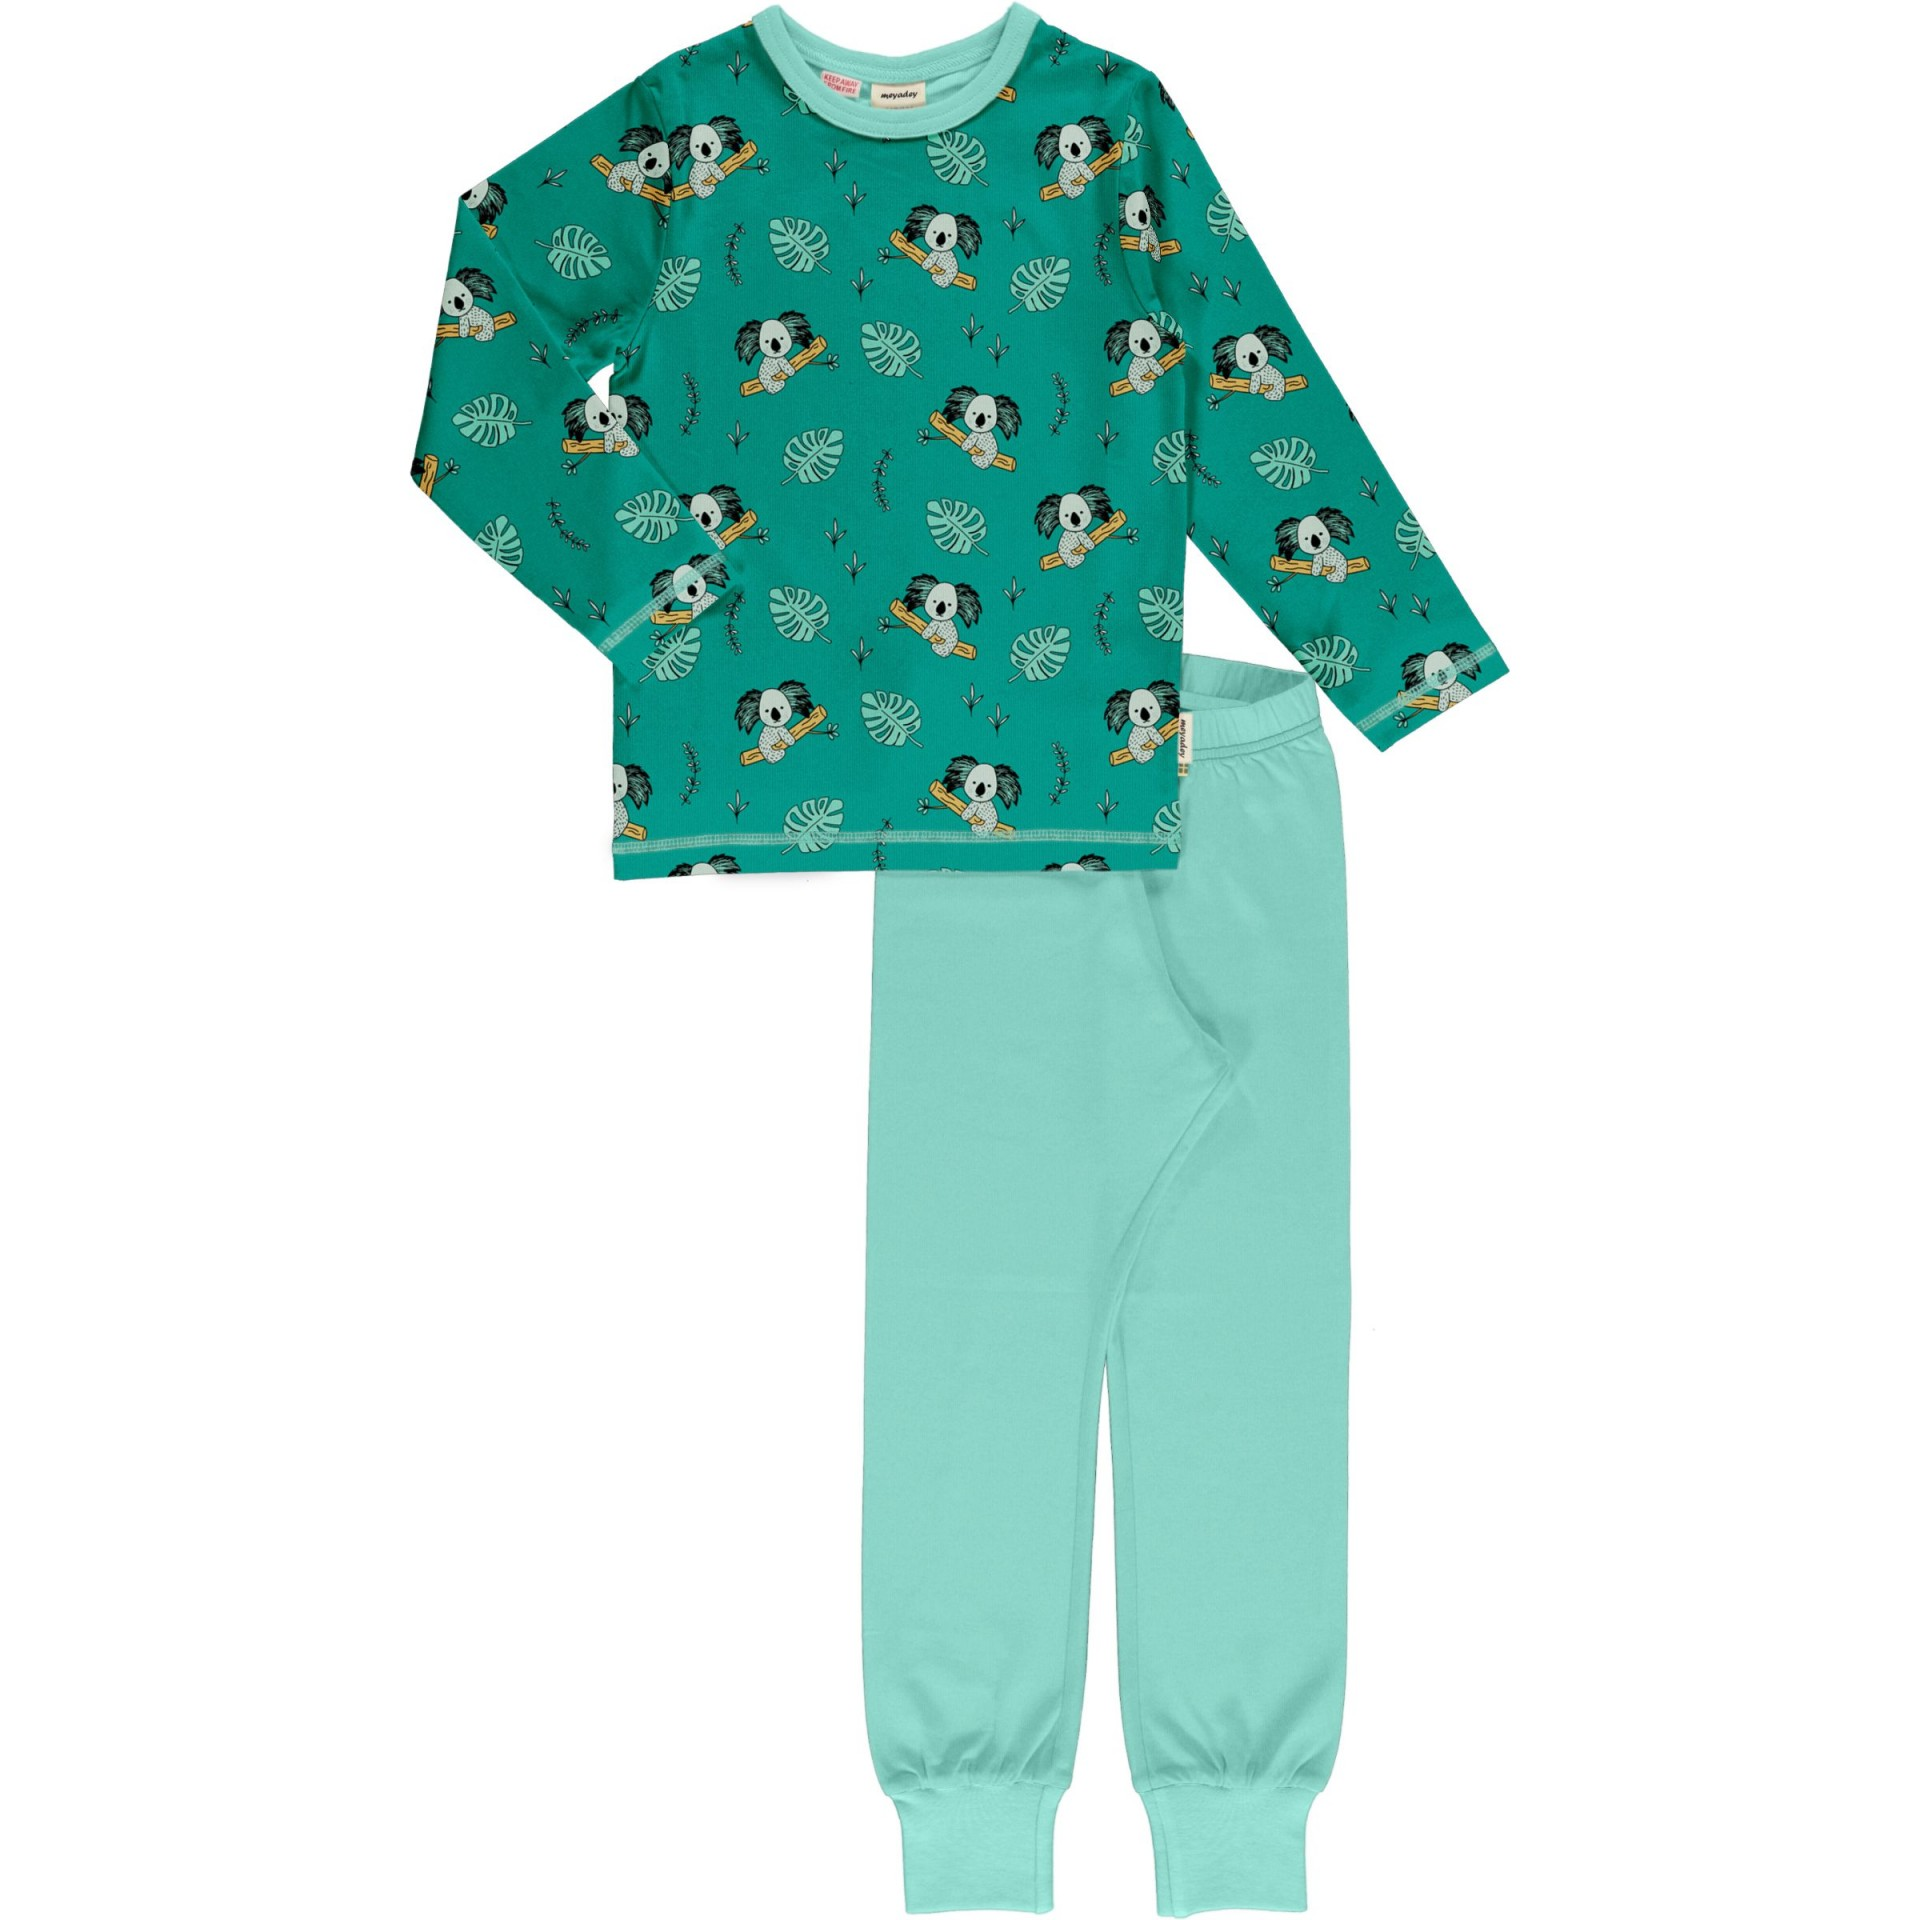 Pijama KOALA GARDEN Meyaday (Tamanhos disponíveis 9-12m, 18-24m, 3-4a, 5-6a, 7-8a, 9-10a)